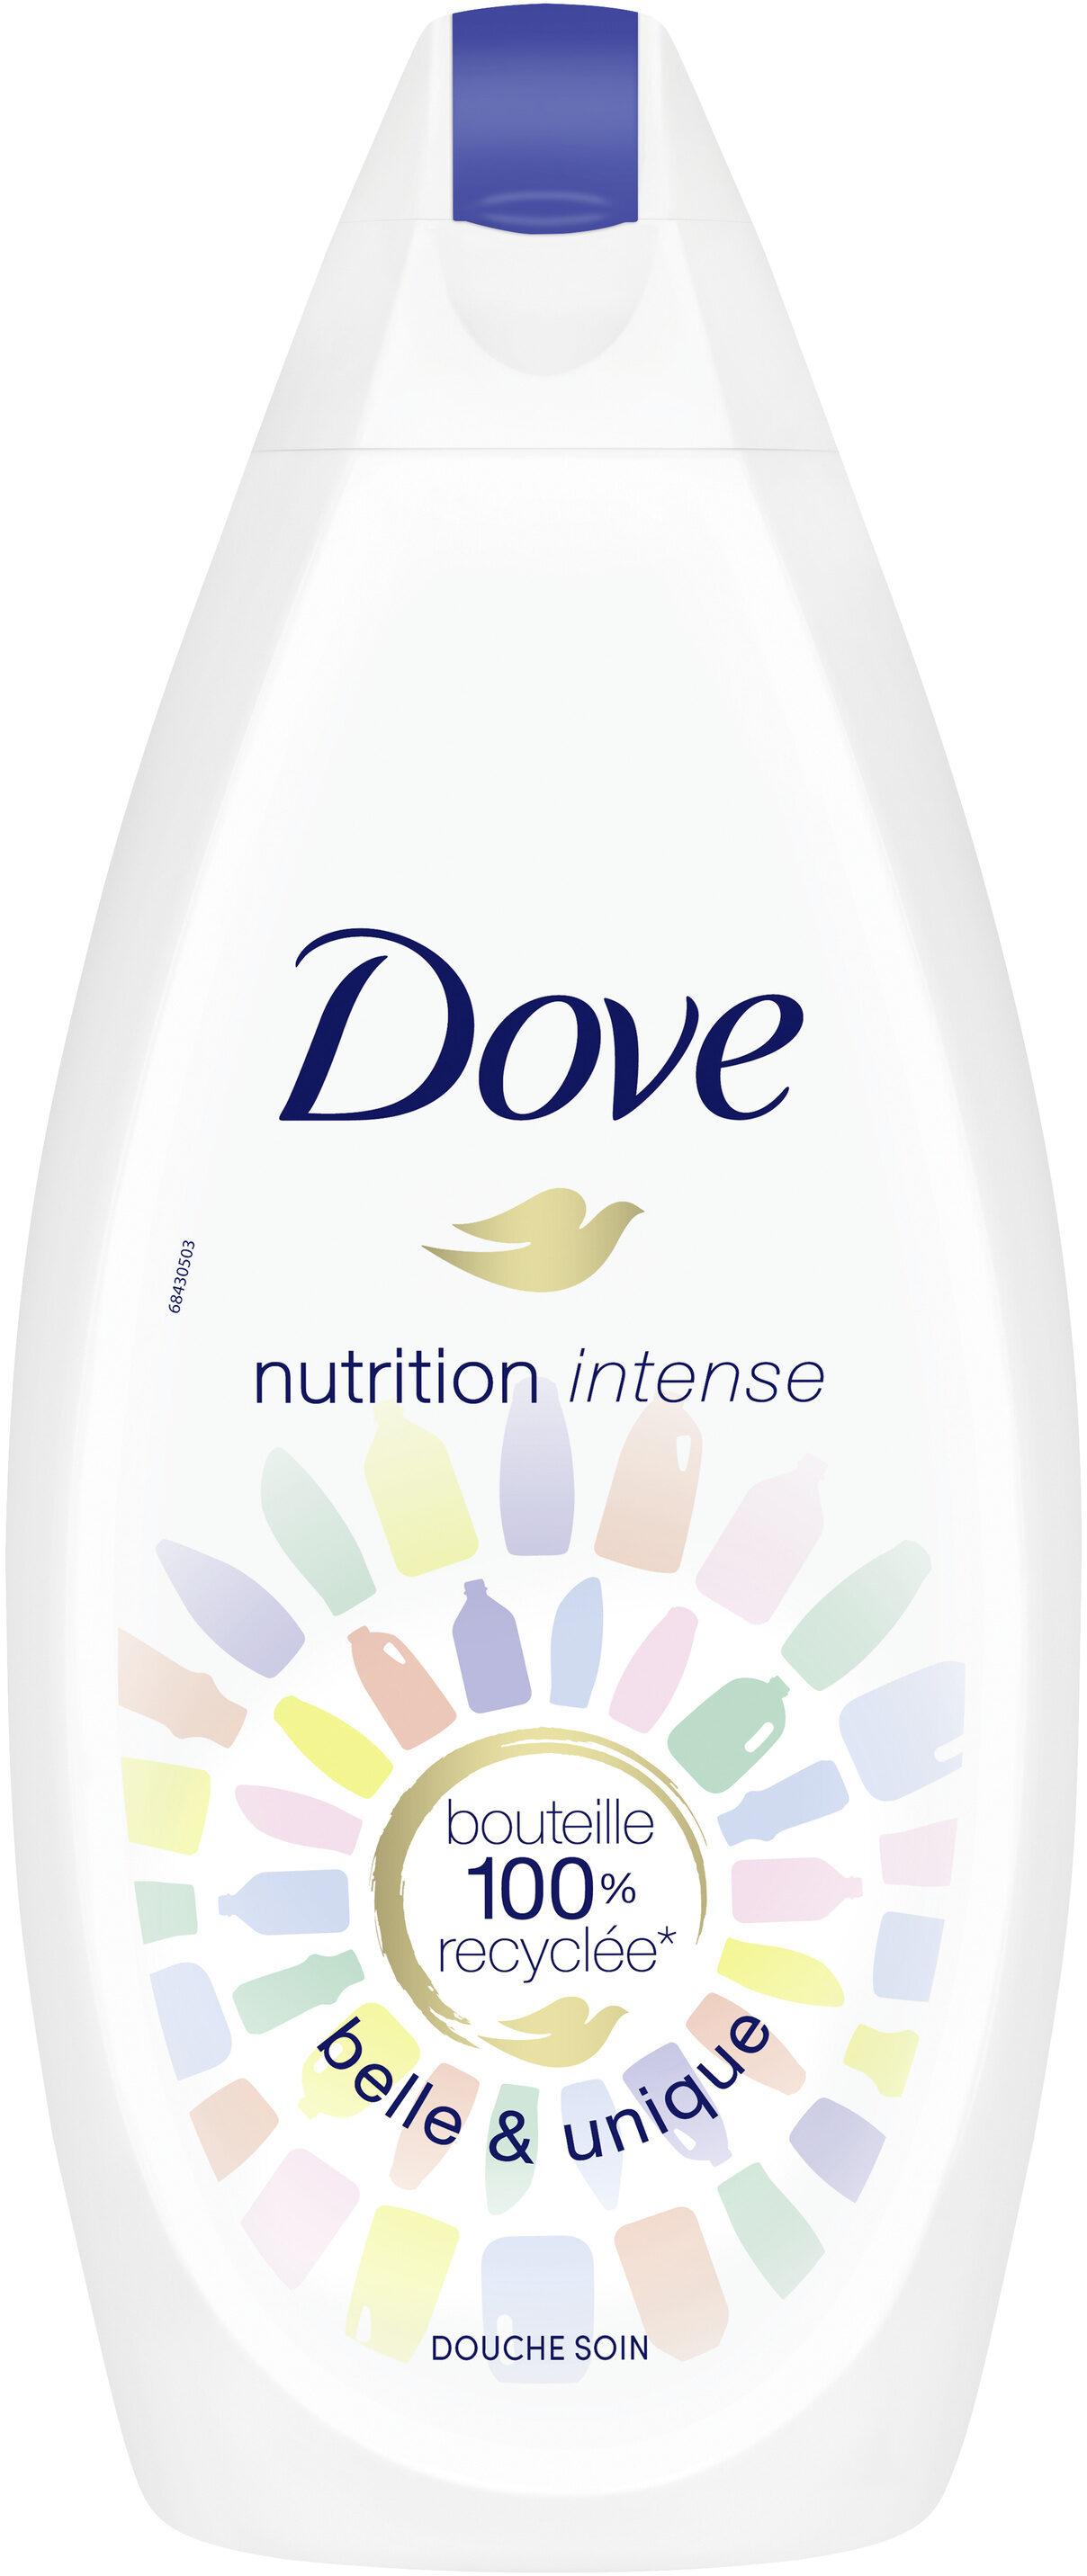 Dove Gel Douche Nutrition Intense - Product - fr